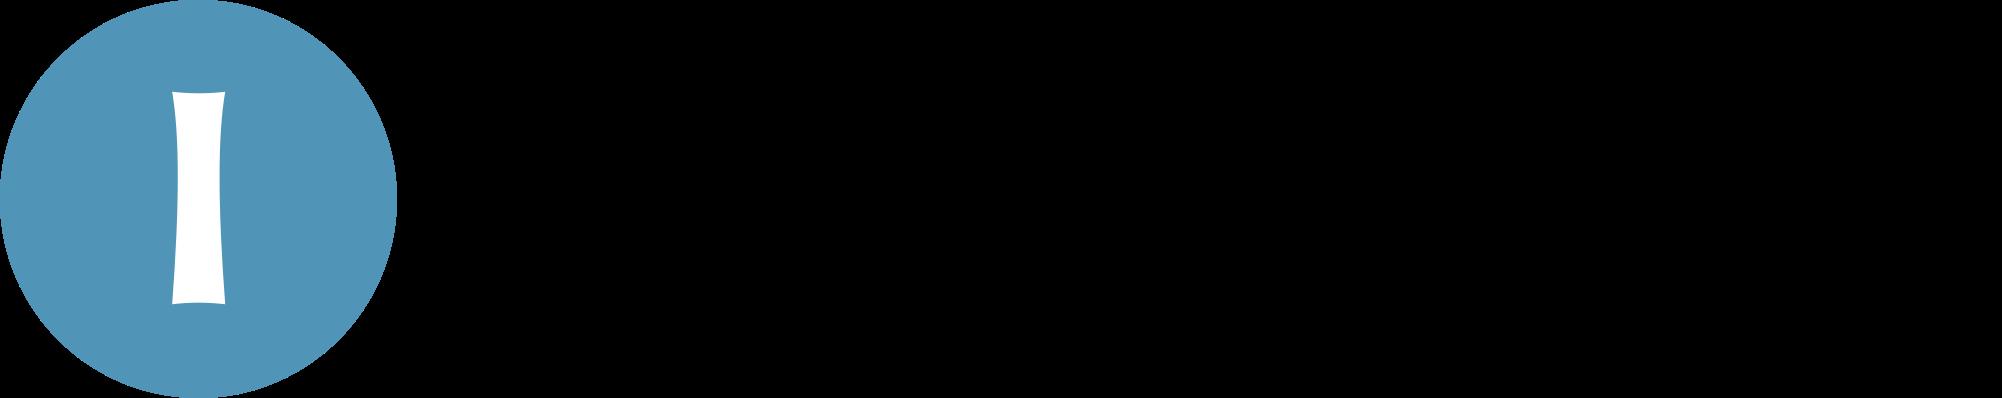 Icon Films